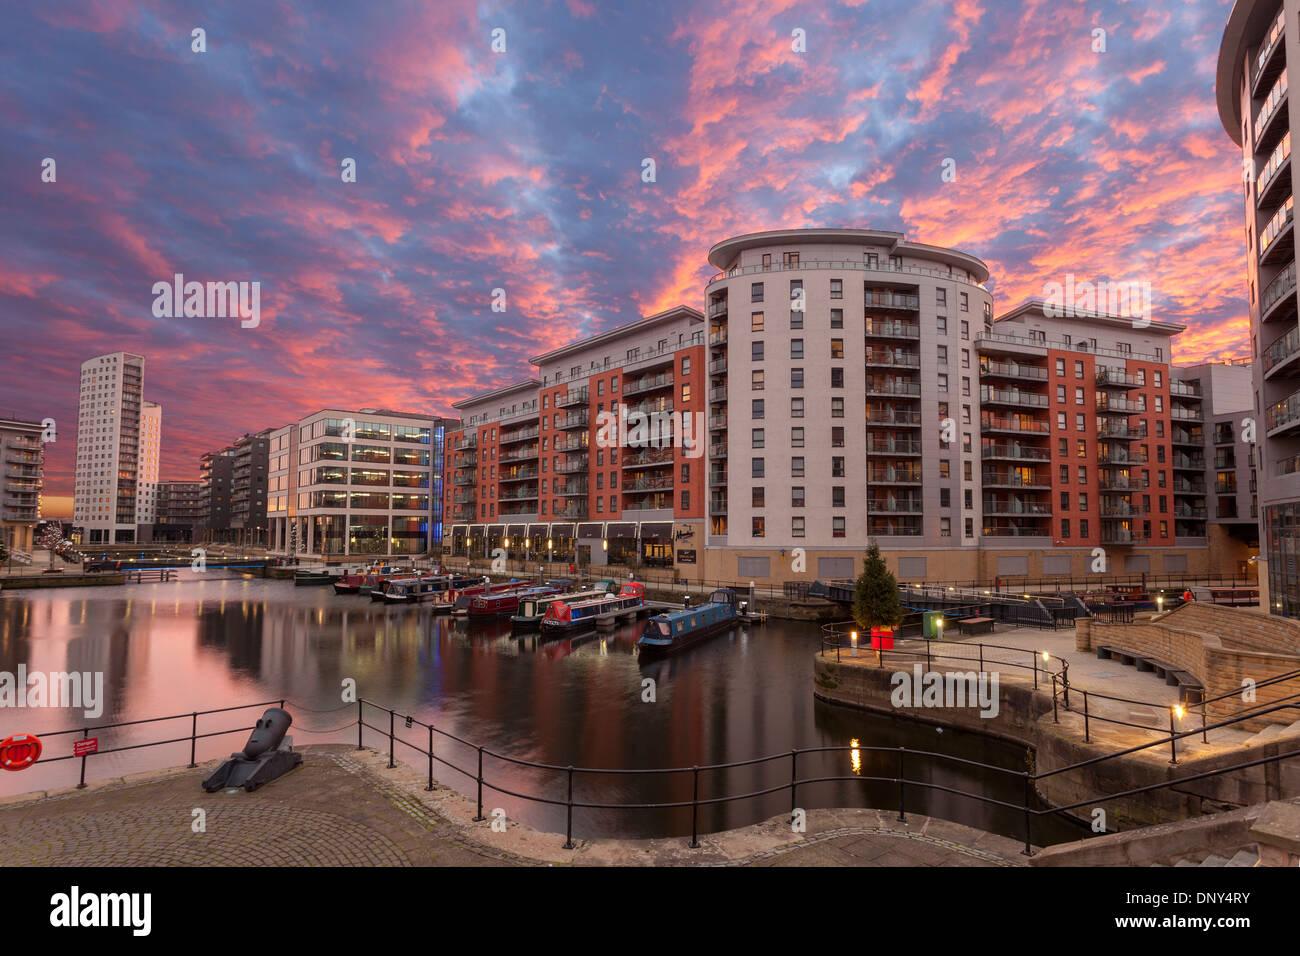 Clarence Docks, Leeds, Yorkshire - Stock Image